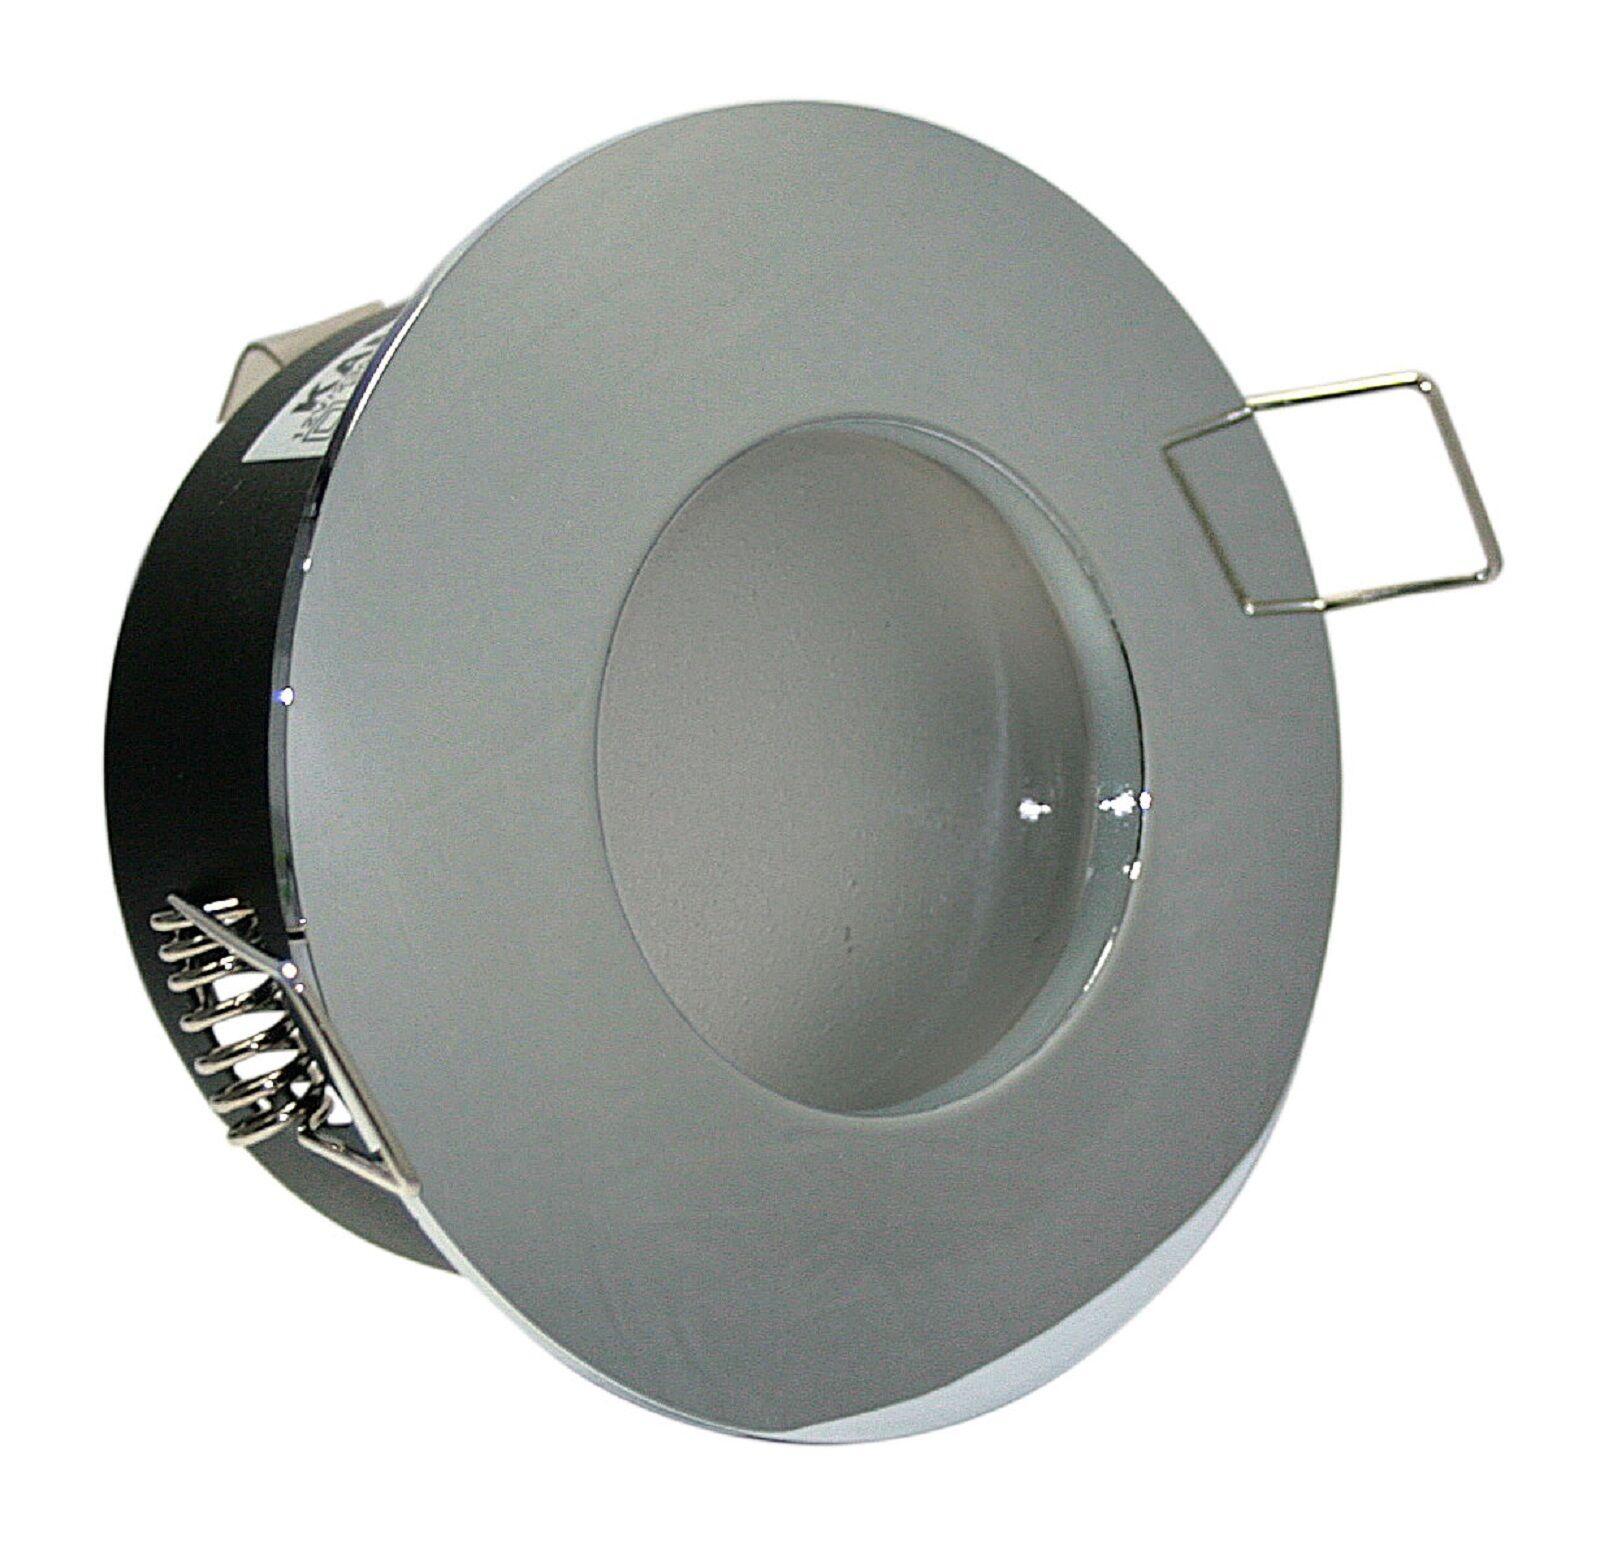 Badezimmer Feuchtraum Einbauleuchte Aqua IP65 + GU10 230V 5W HIGH POWER LED COB